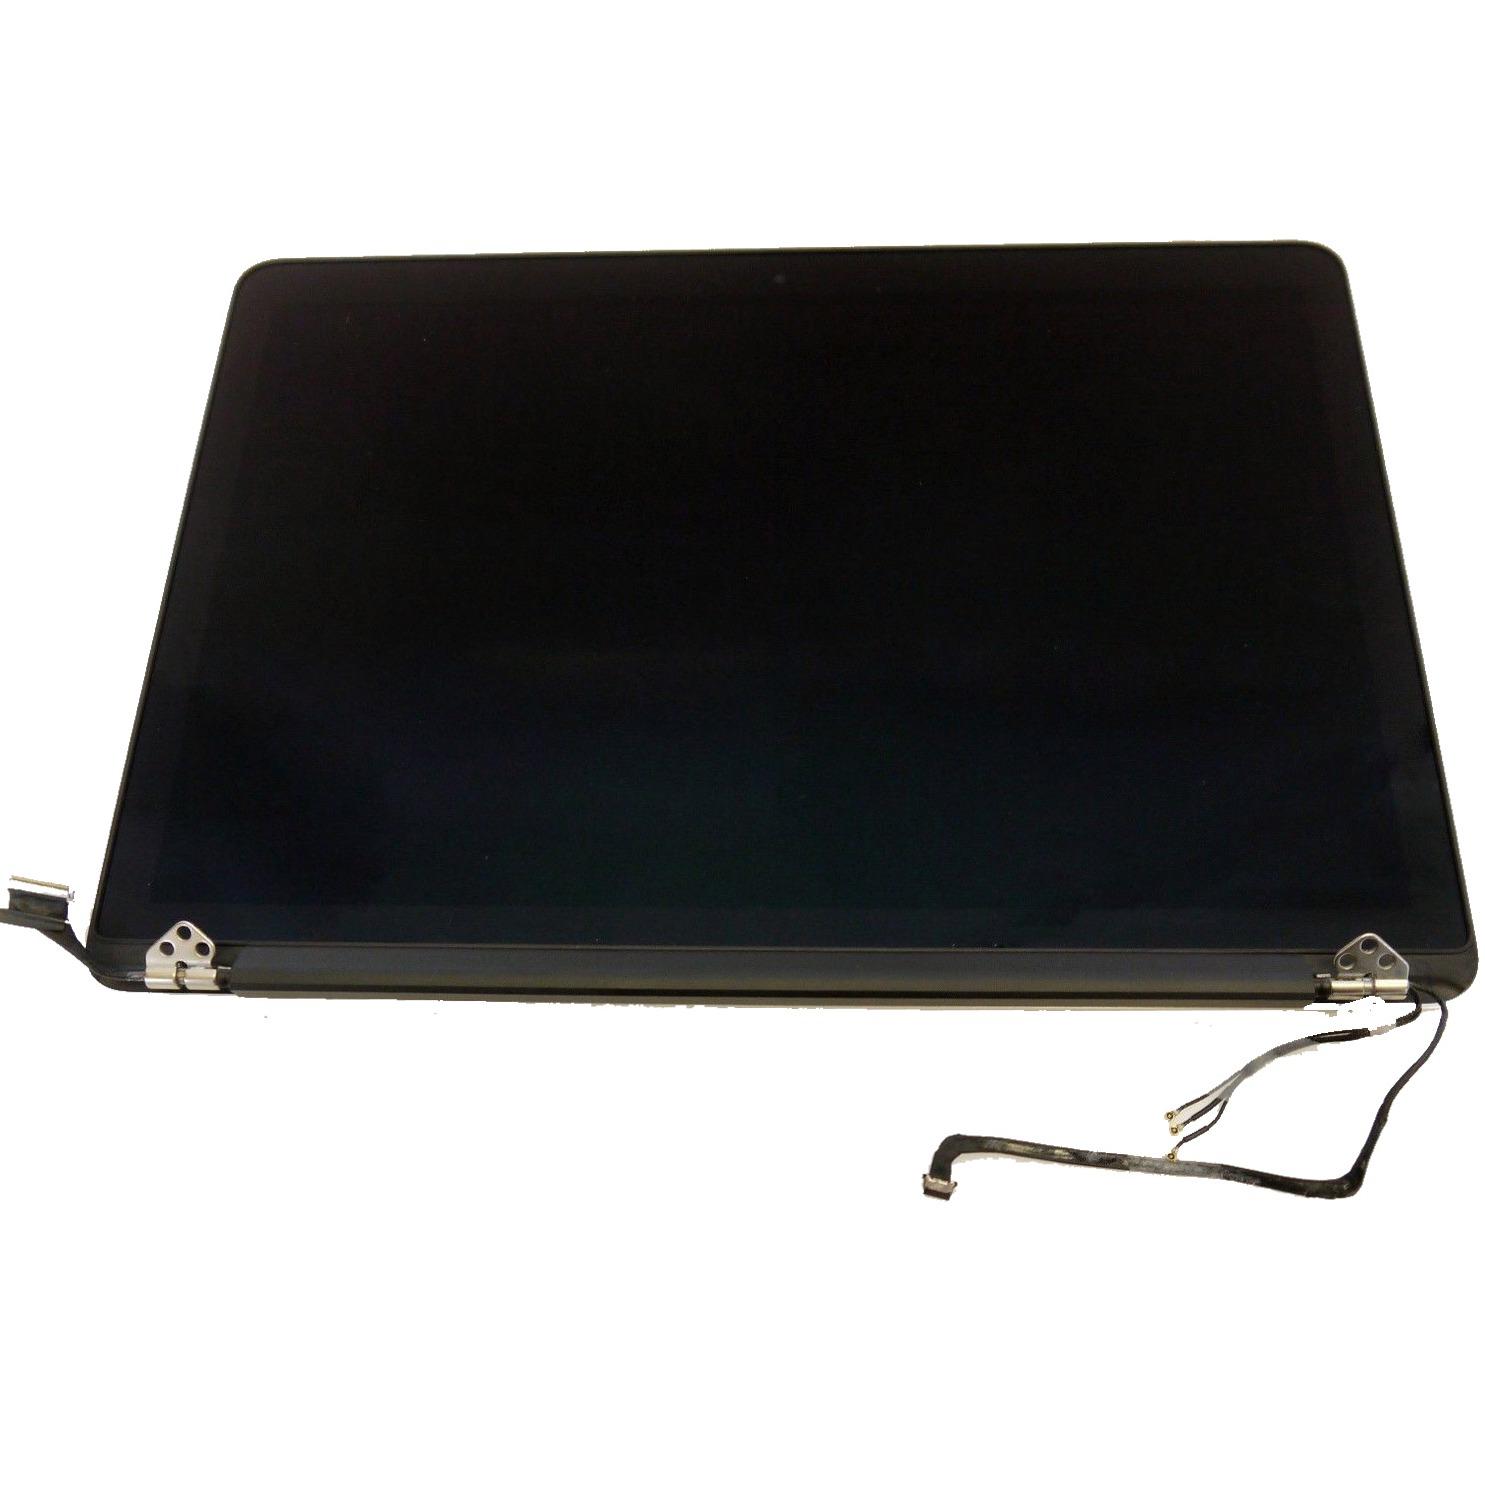 refurbished macbook pro a1502 retina display 13 full lcd assembly late 2013 ebay. Black Bedroom Furniture Sets. Home Design Ideas